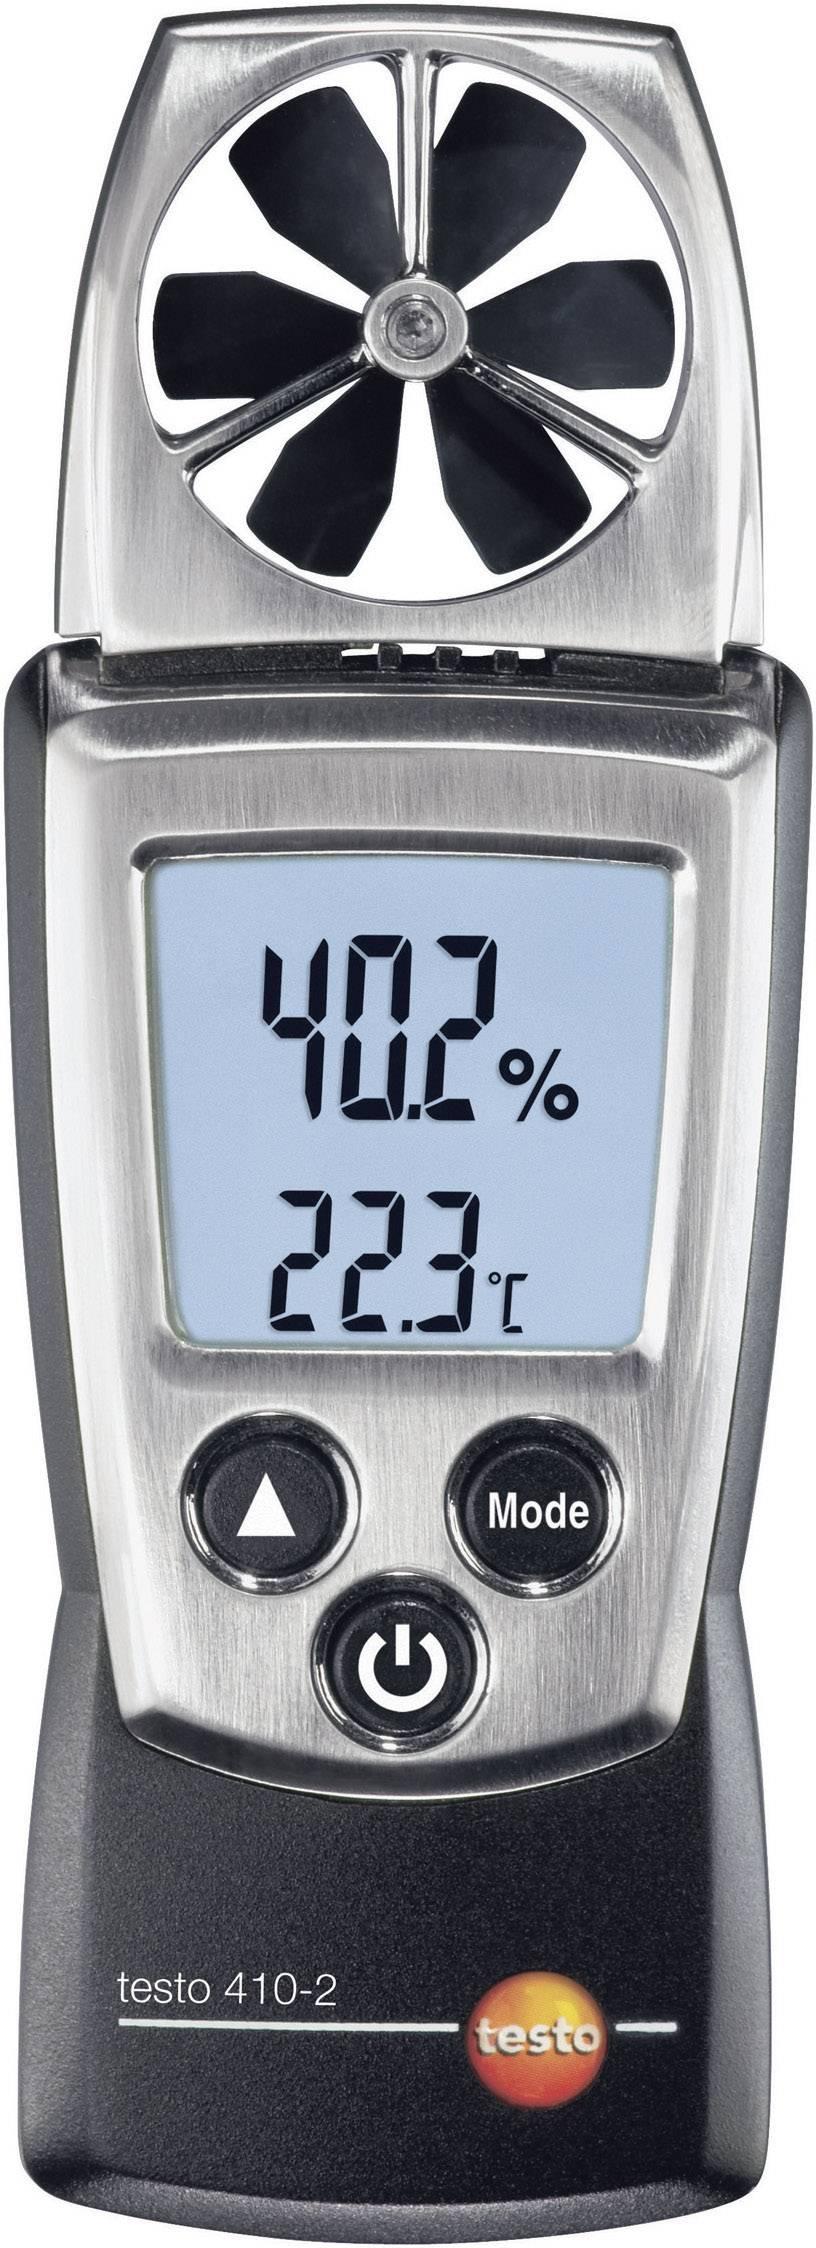 Anemometr testo 410-2, 0,4 - 20 m/s